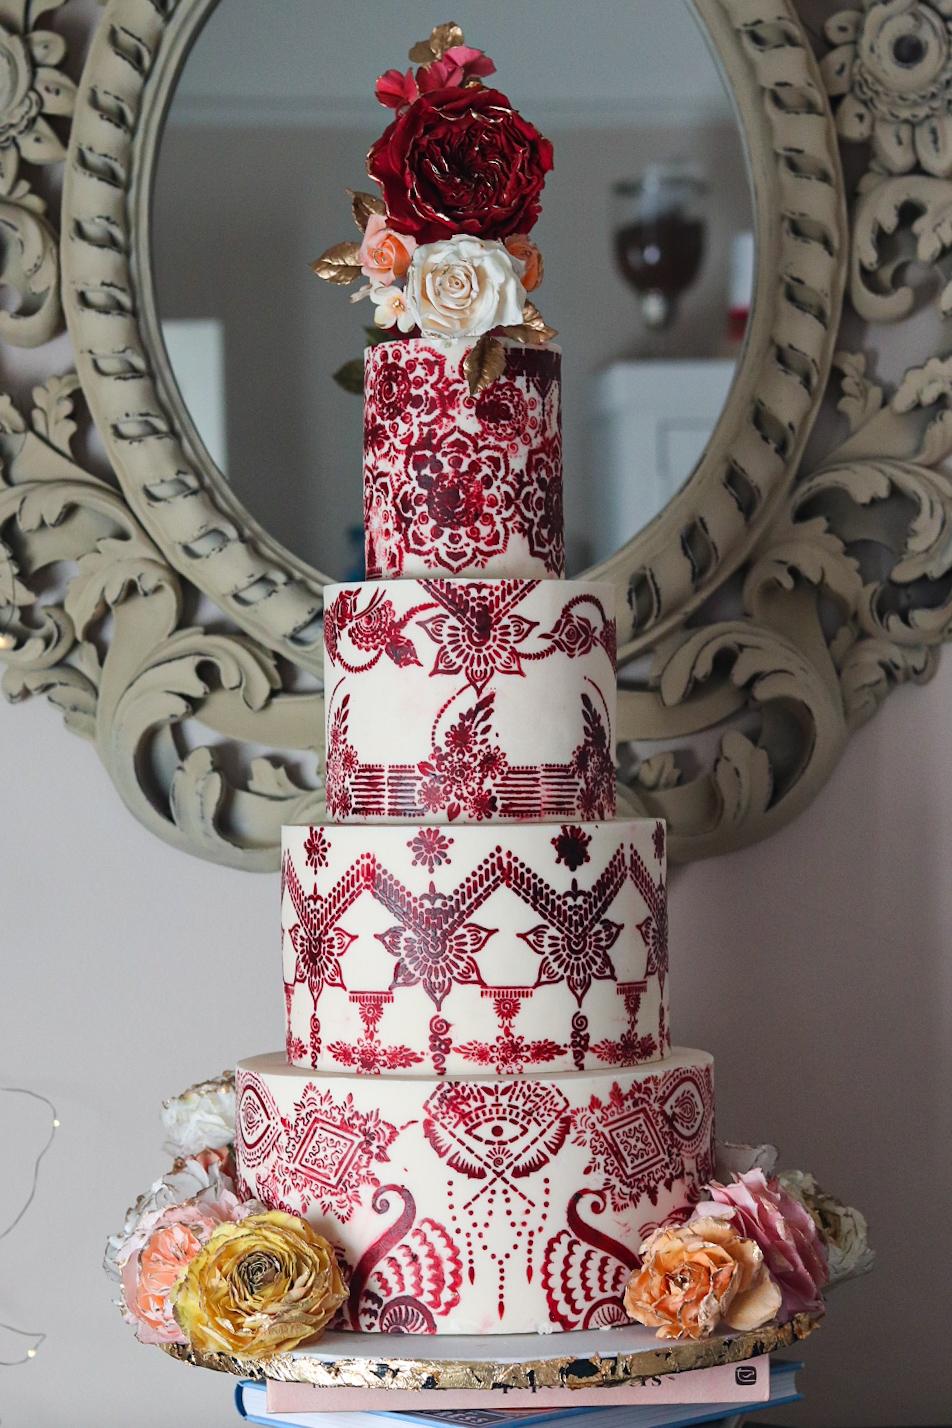 vilicomkrozhrvatsku_monikakos_ottolenghi_torta